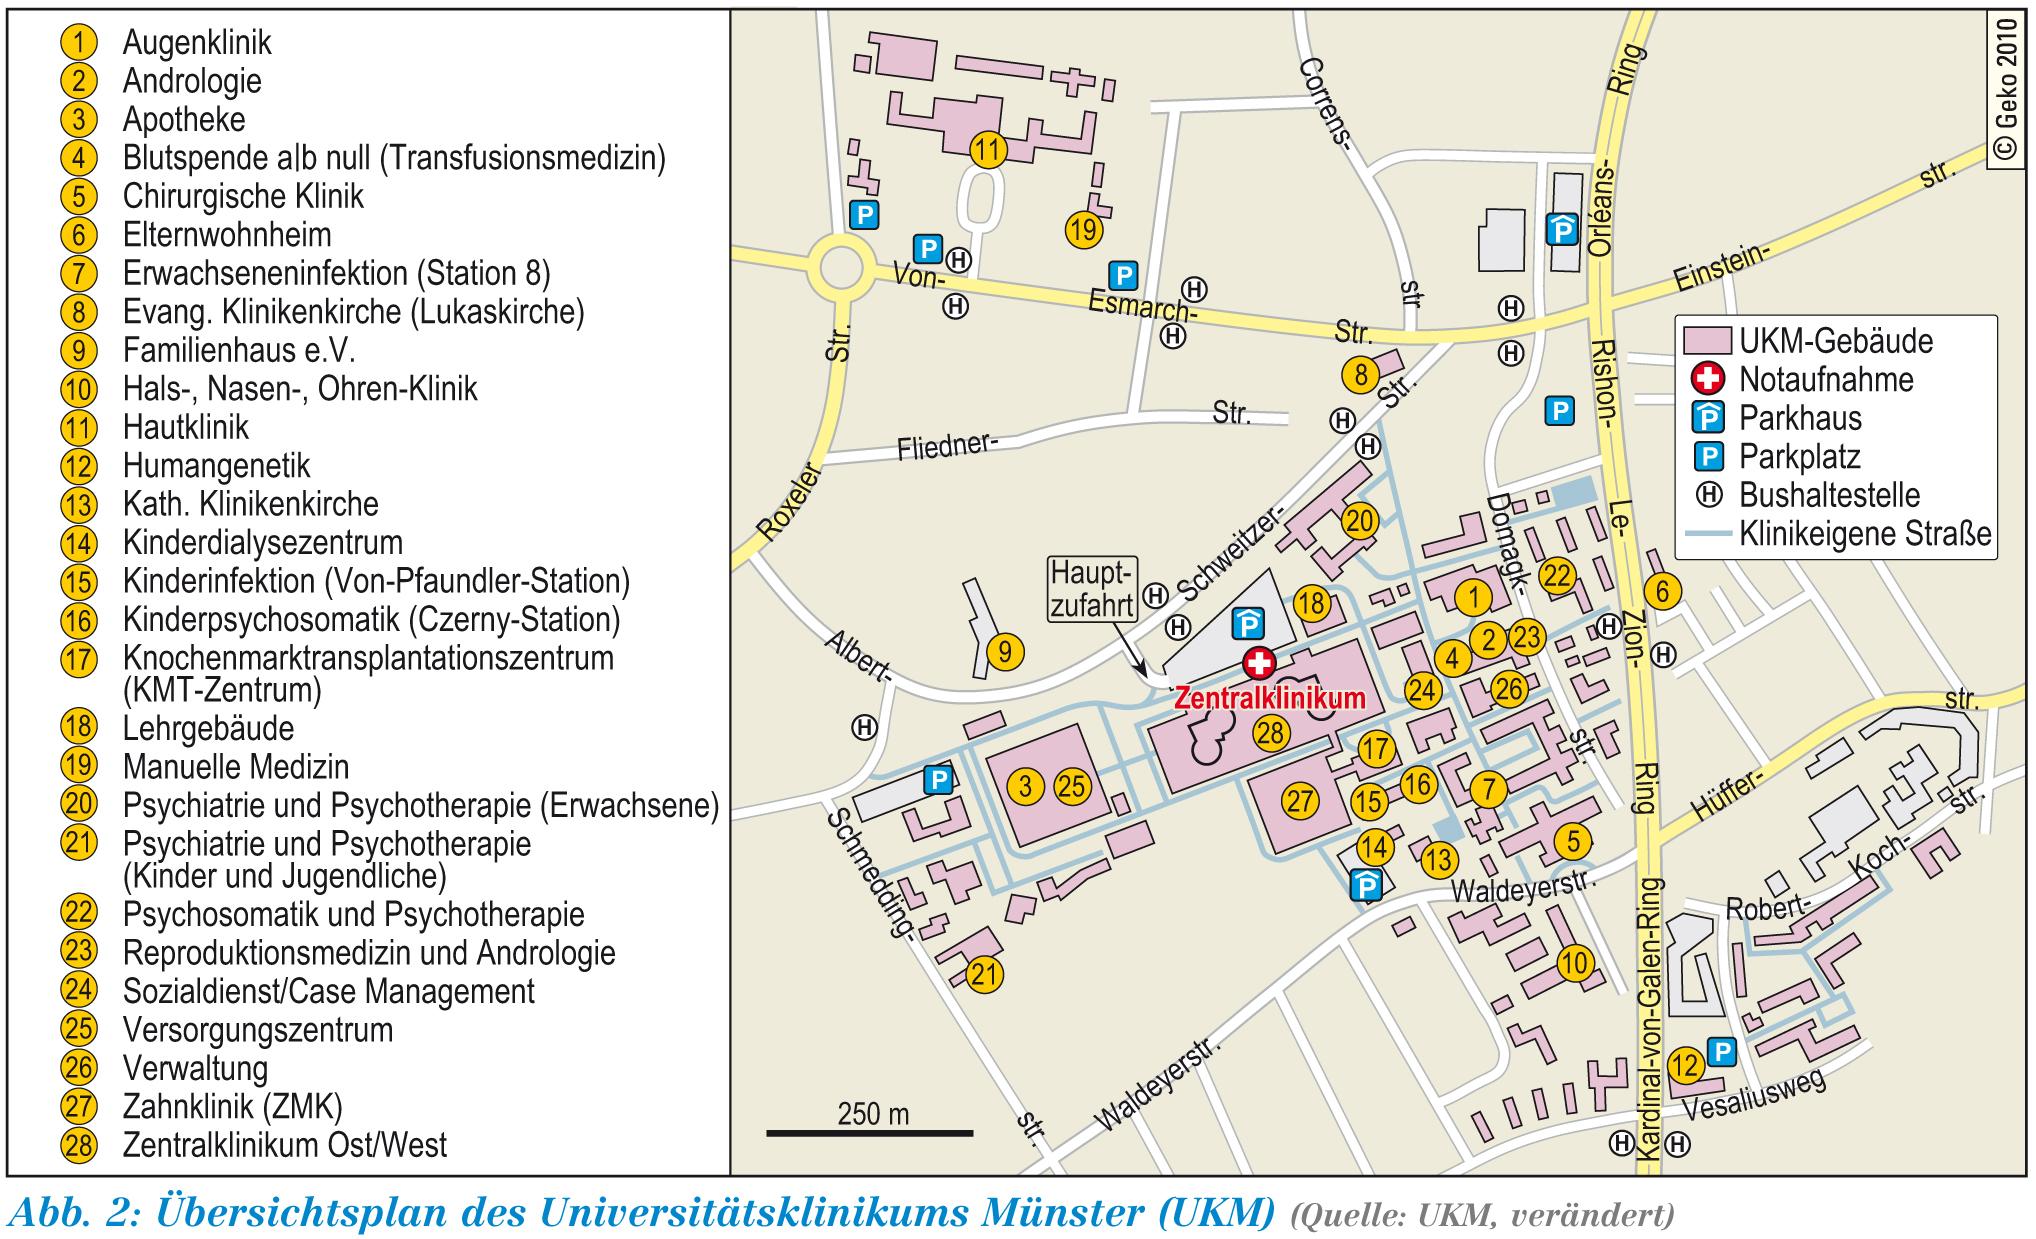 LWL - Das Universitätsklinikum Münster - Westfalen Regional